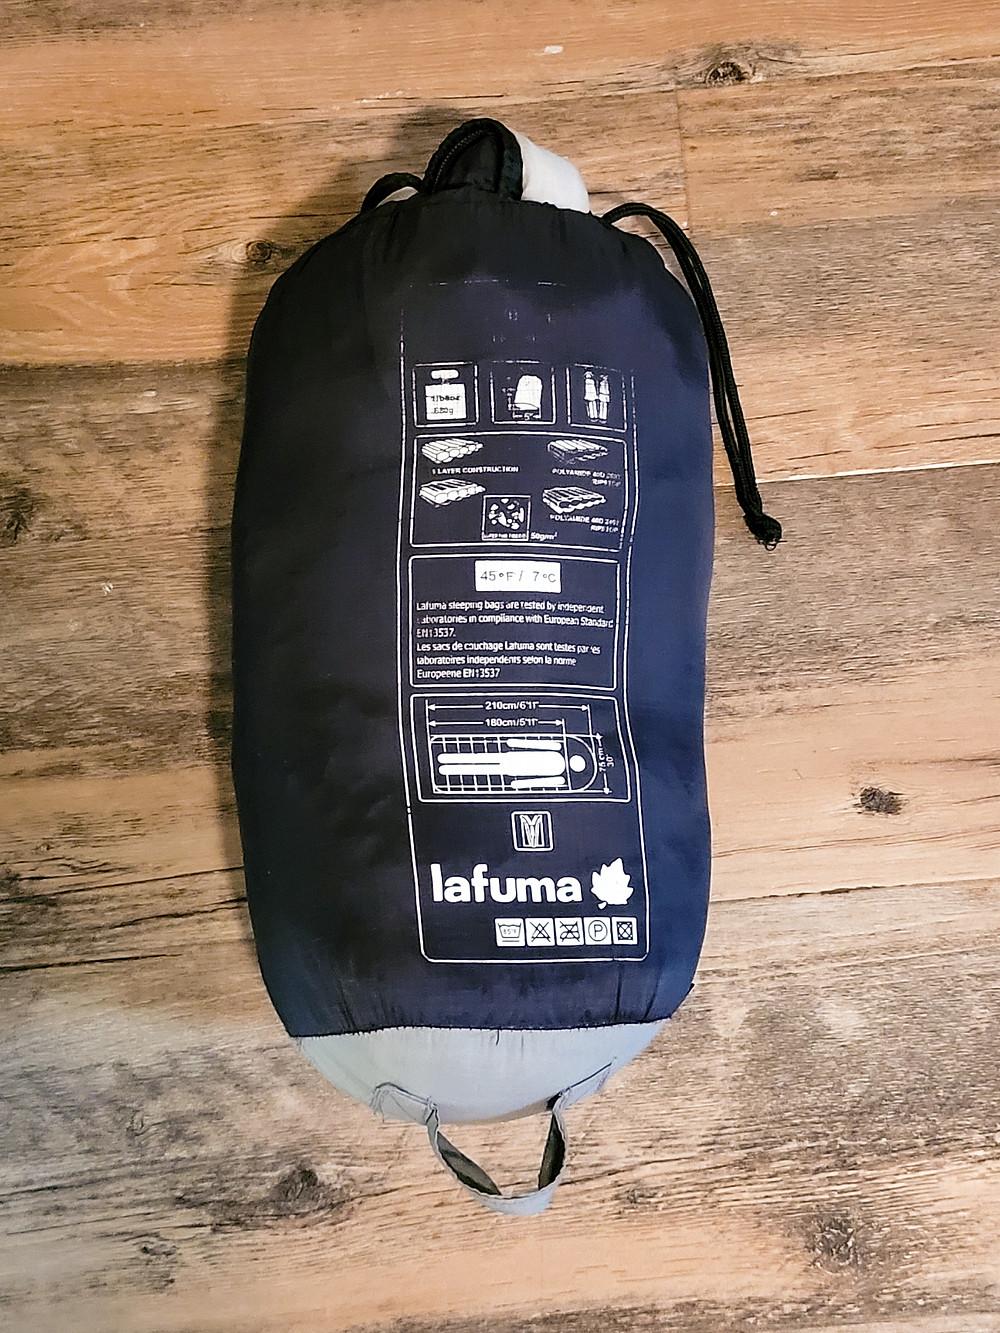 Backpacking, travel, travel gear, travel tips, sleeping bag, Lafuma